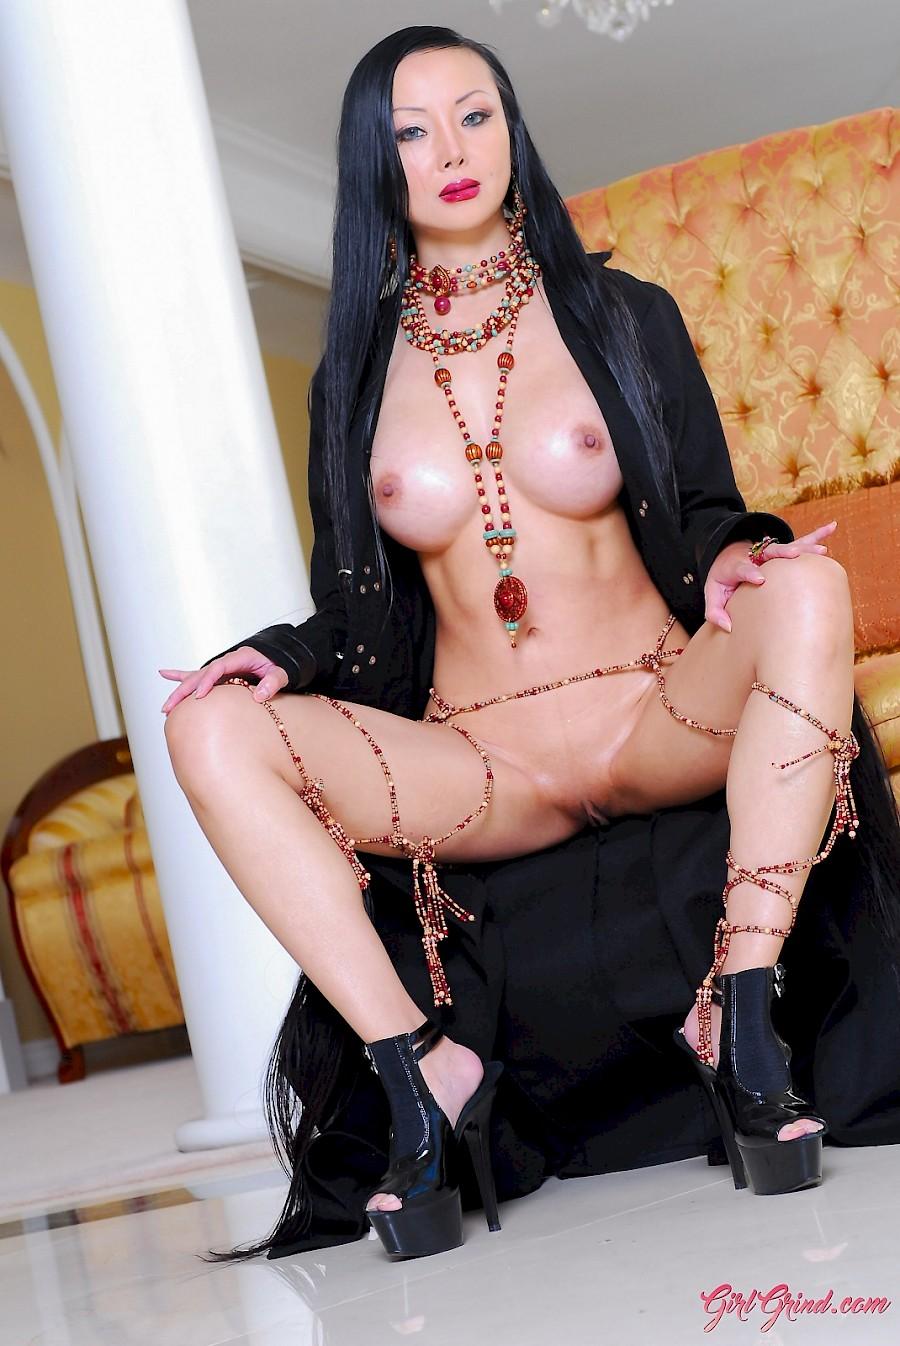 Angie Venus Porn Star Cumshots ange venus lesbian sex - sexo18 free sexy babes pics nude